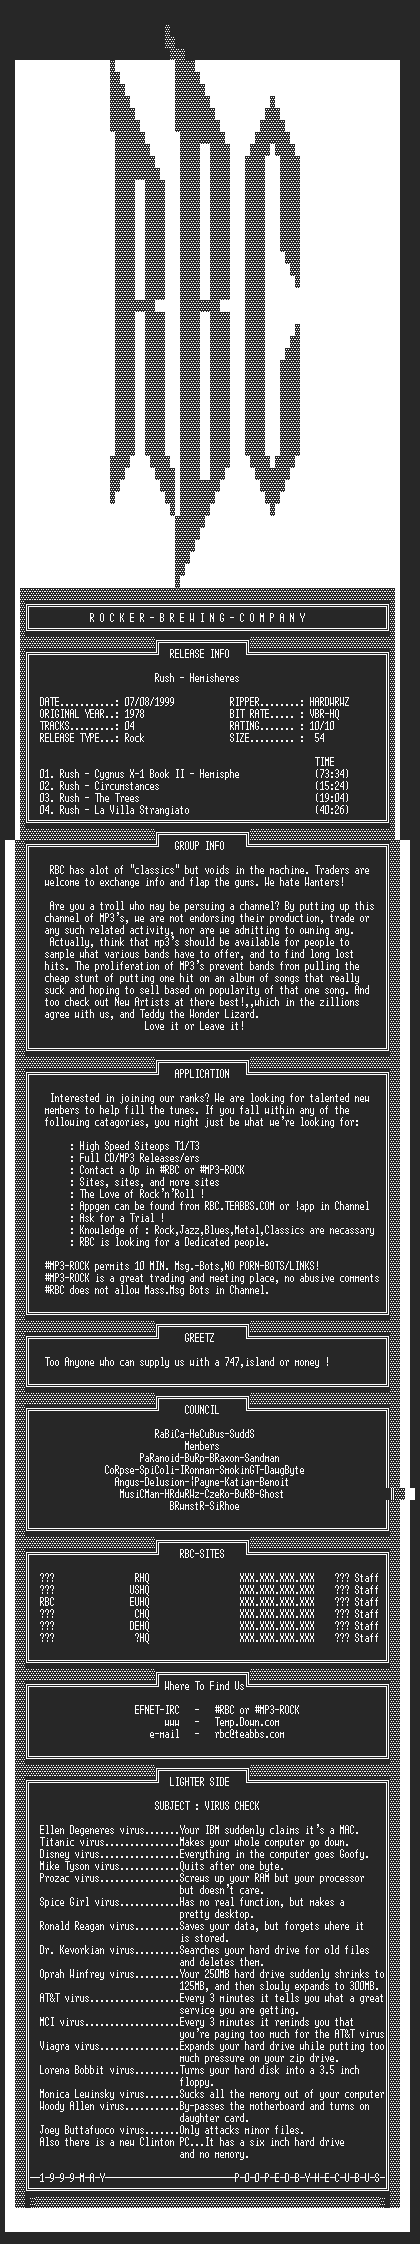 NFO file for Rush_-_Hemispheres_(1978)_-_RBC-VBR